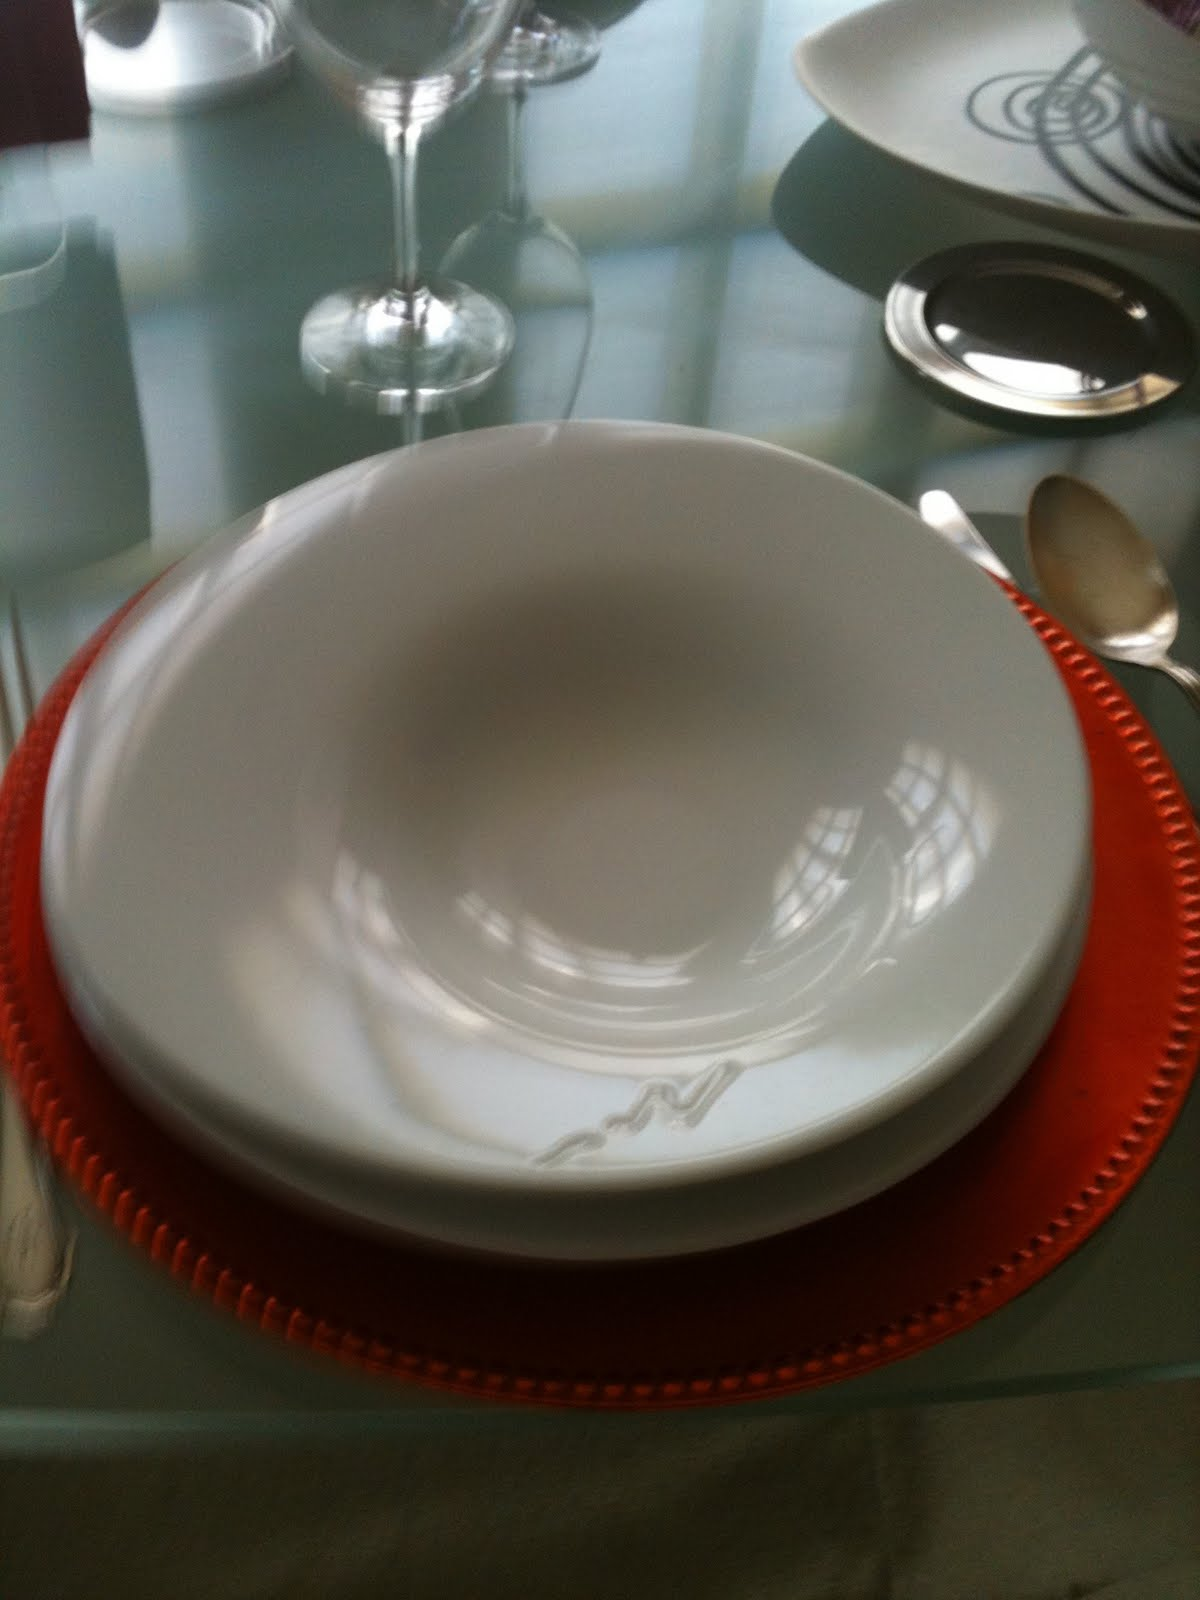 Marisa radicales simples estreno vajilla de ferran adri for Ferran adria platos